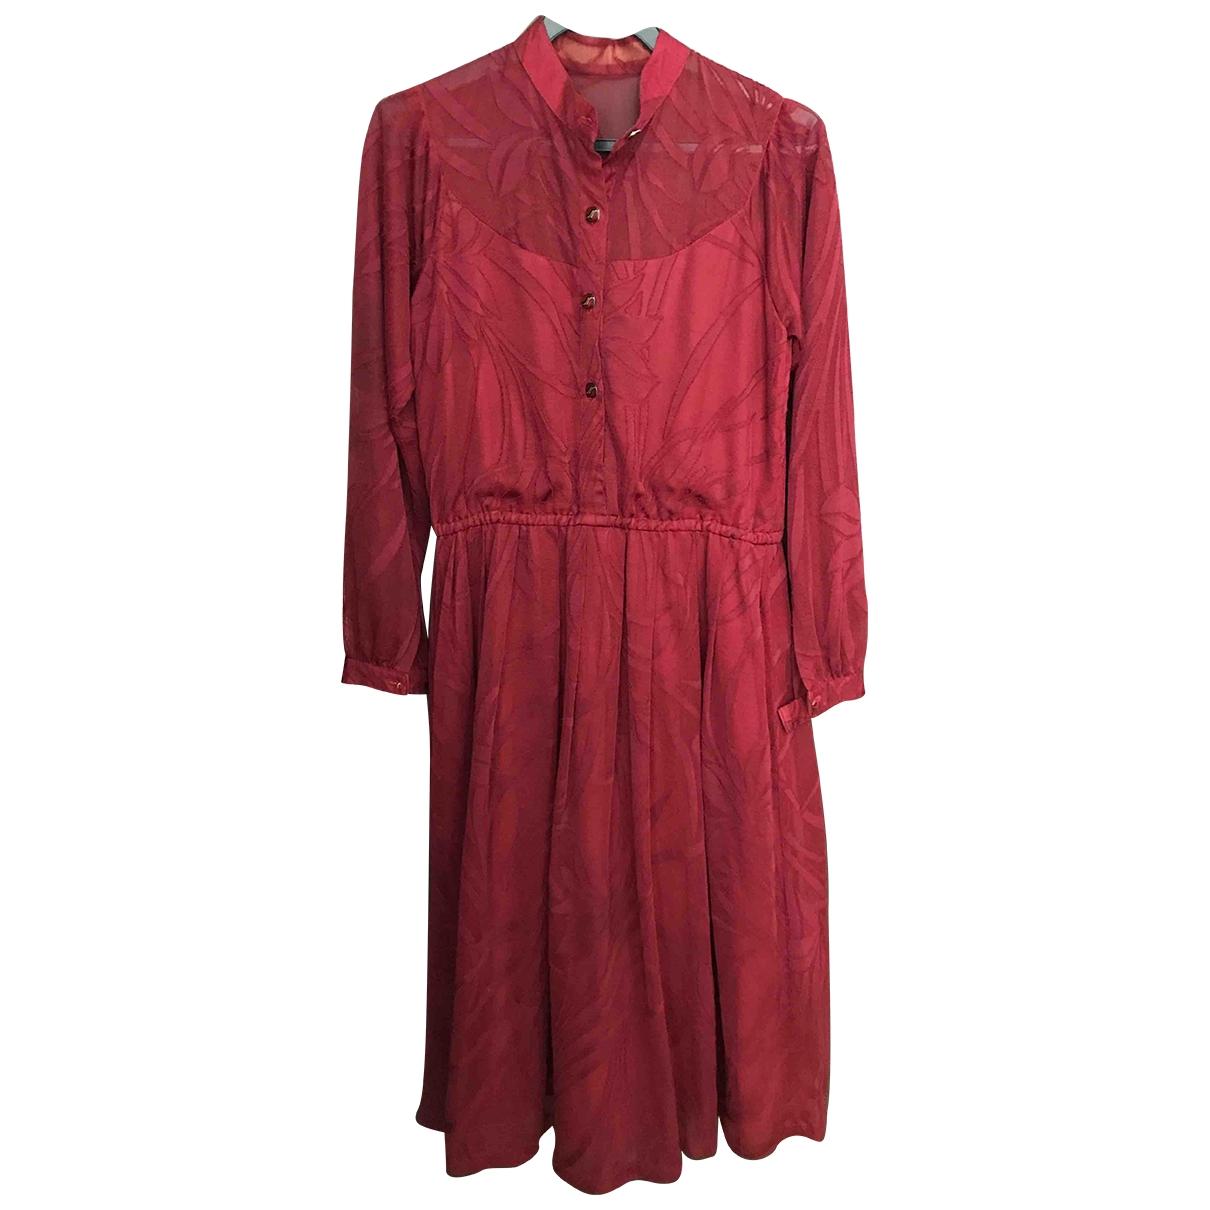 Non Signé / Unsigned \N Burgundy dress for Women M International